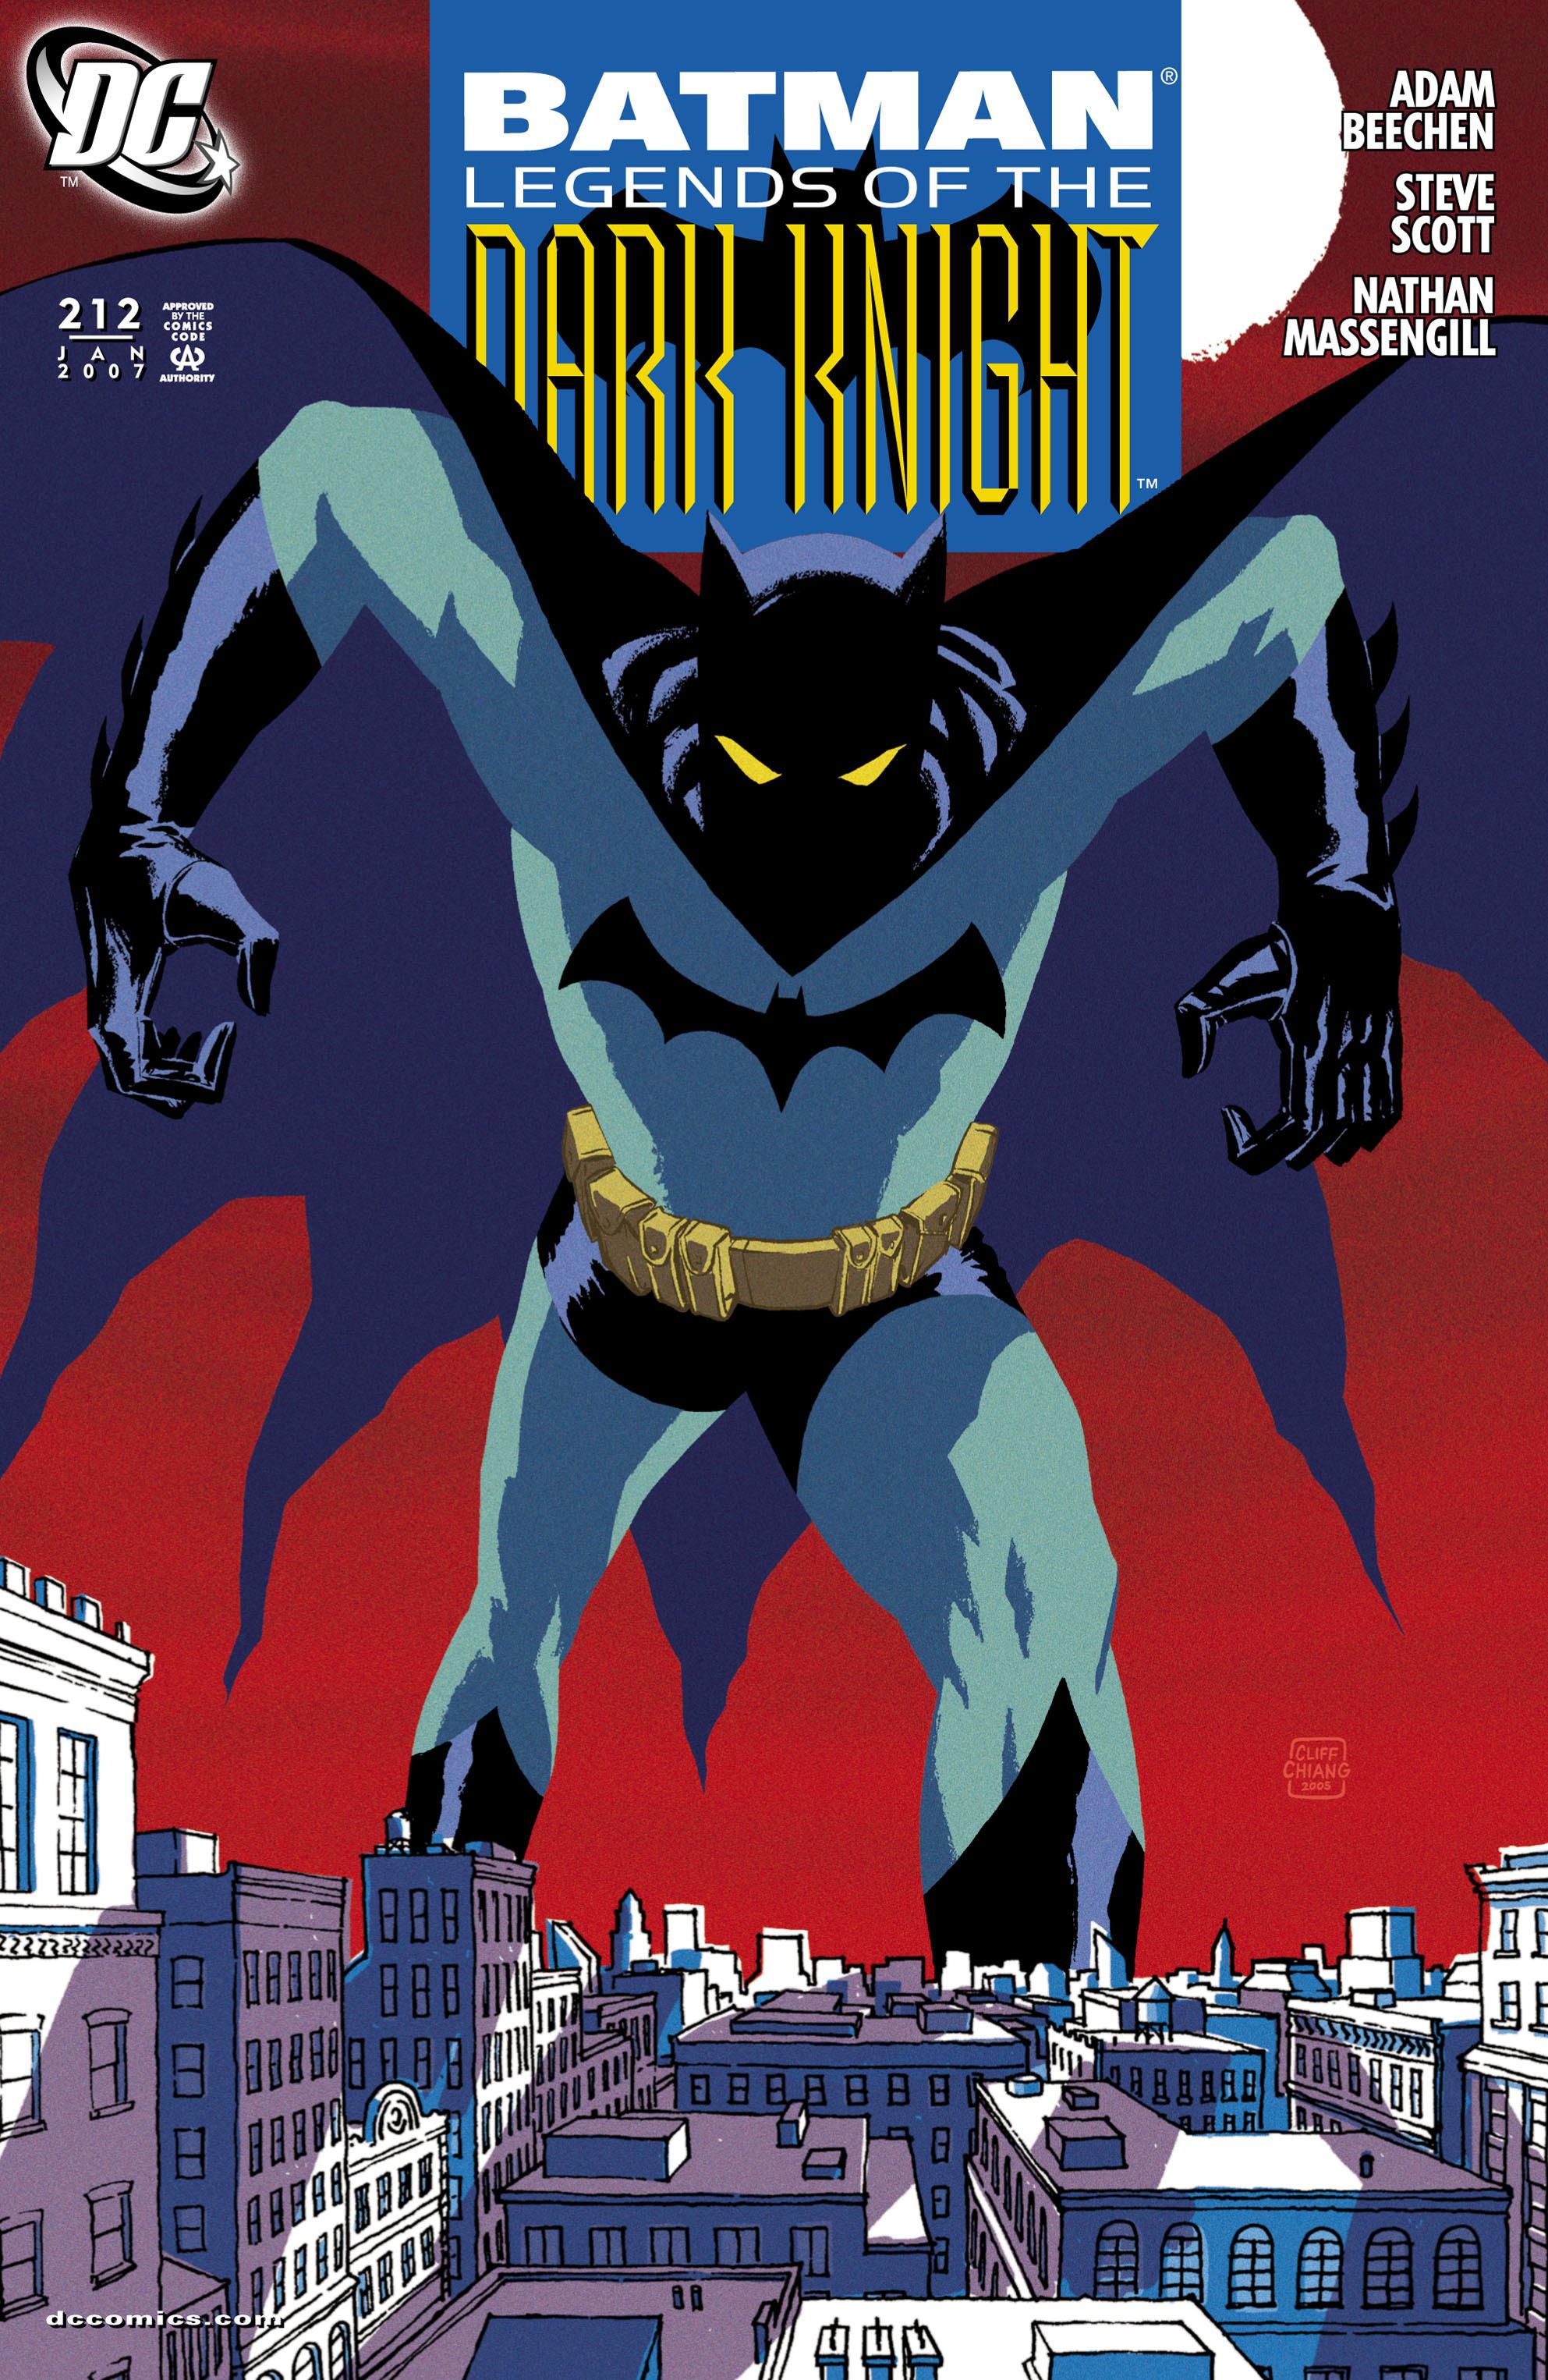 Batman: Legends of the Dark Knight 212 Page 1